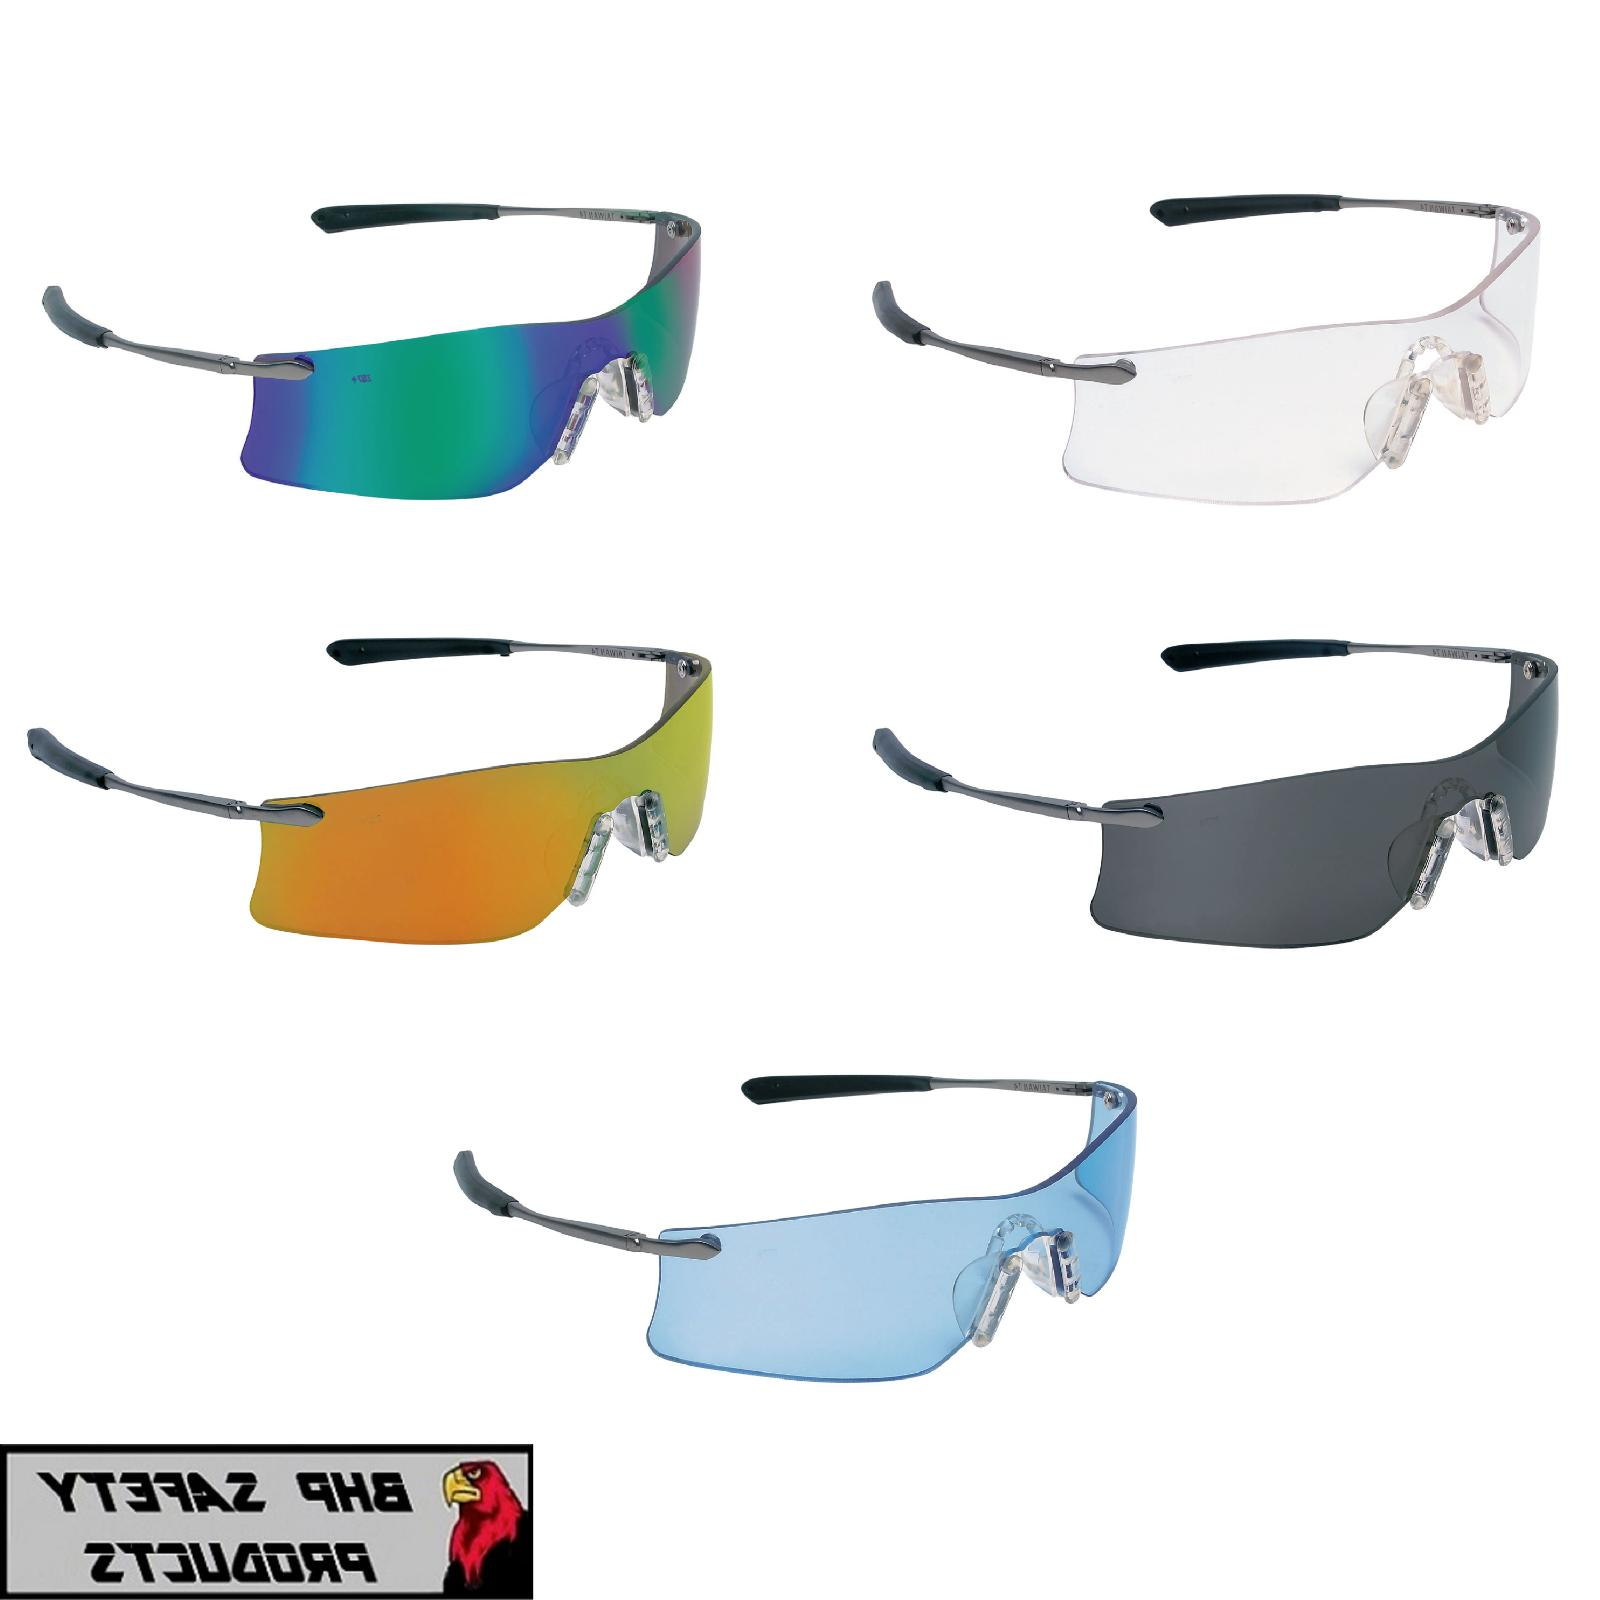 mcr crews rubicon safety glasses sunglasses metal